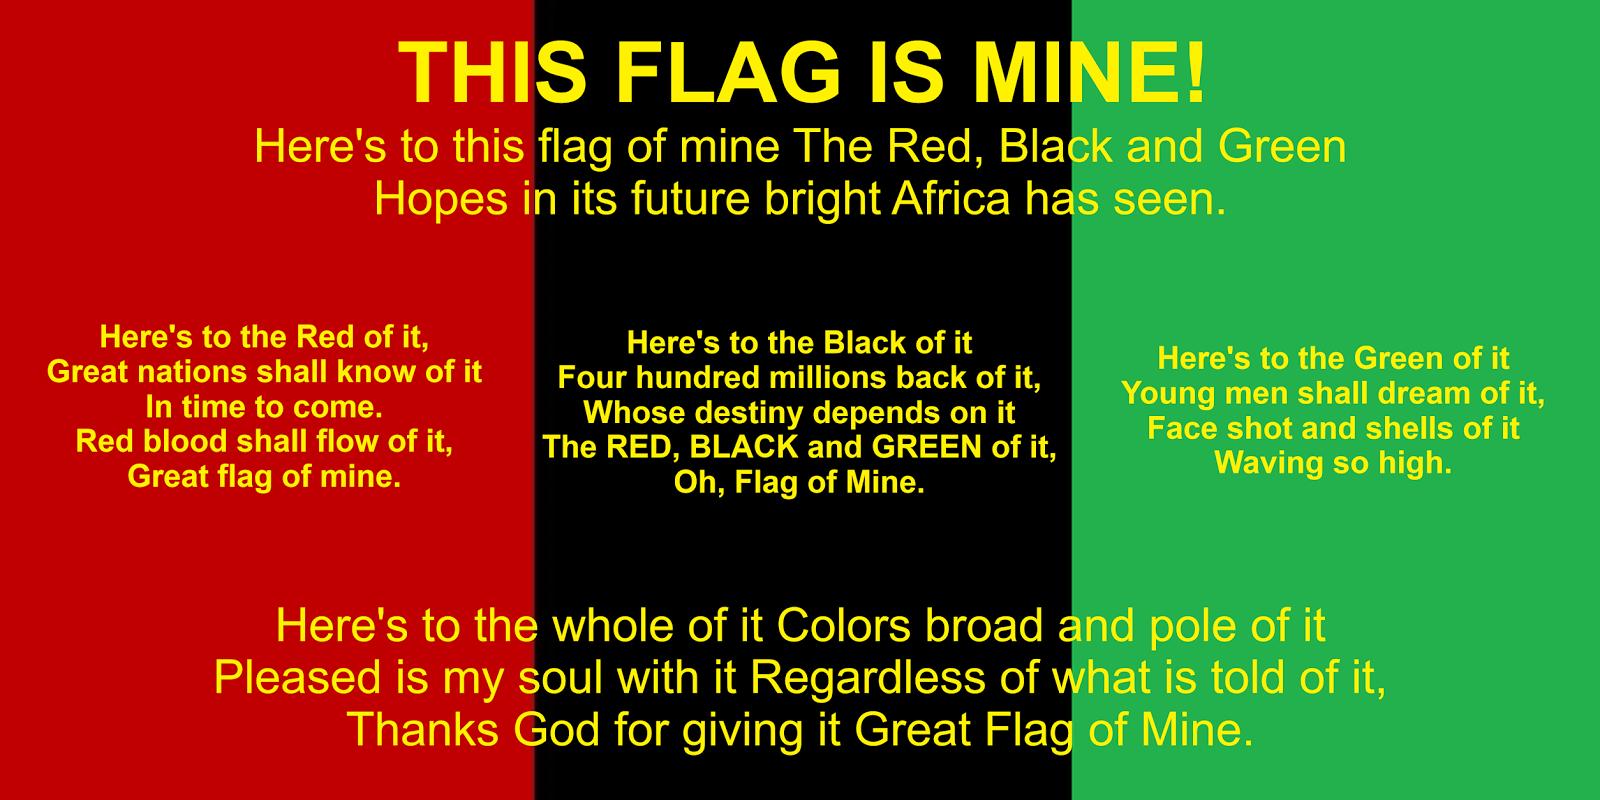 Amen Par Ankh Sacred Temple Of Life Every Black Person On Earth Circuit Boardsart Is Interpretation Https Adenike Amenrapixelscom Featured Rbg Flag Pledge Amenrahtml